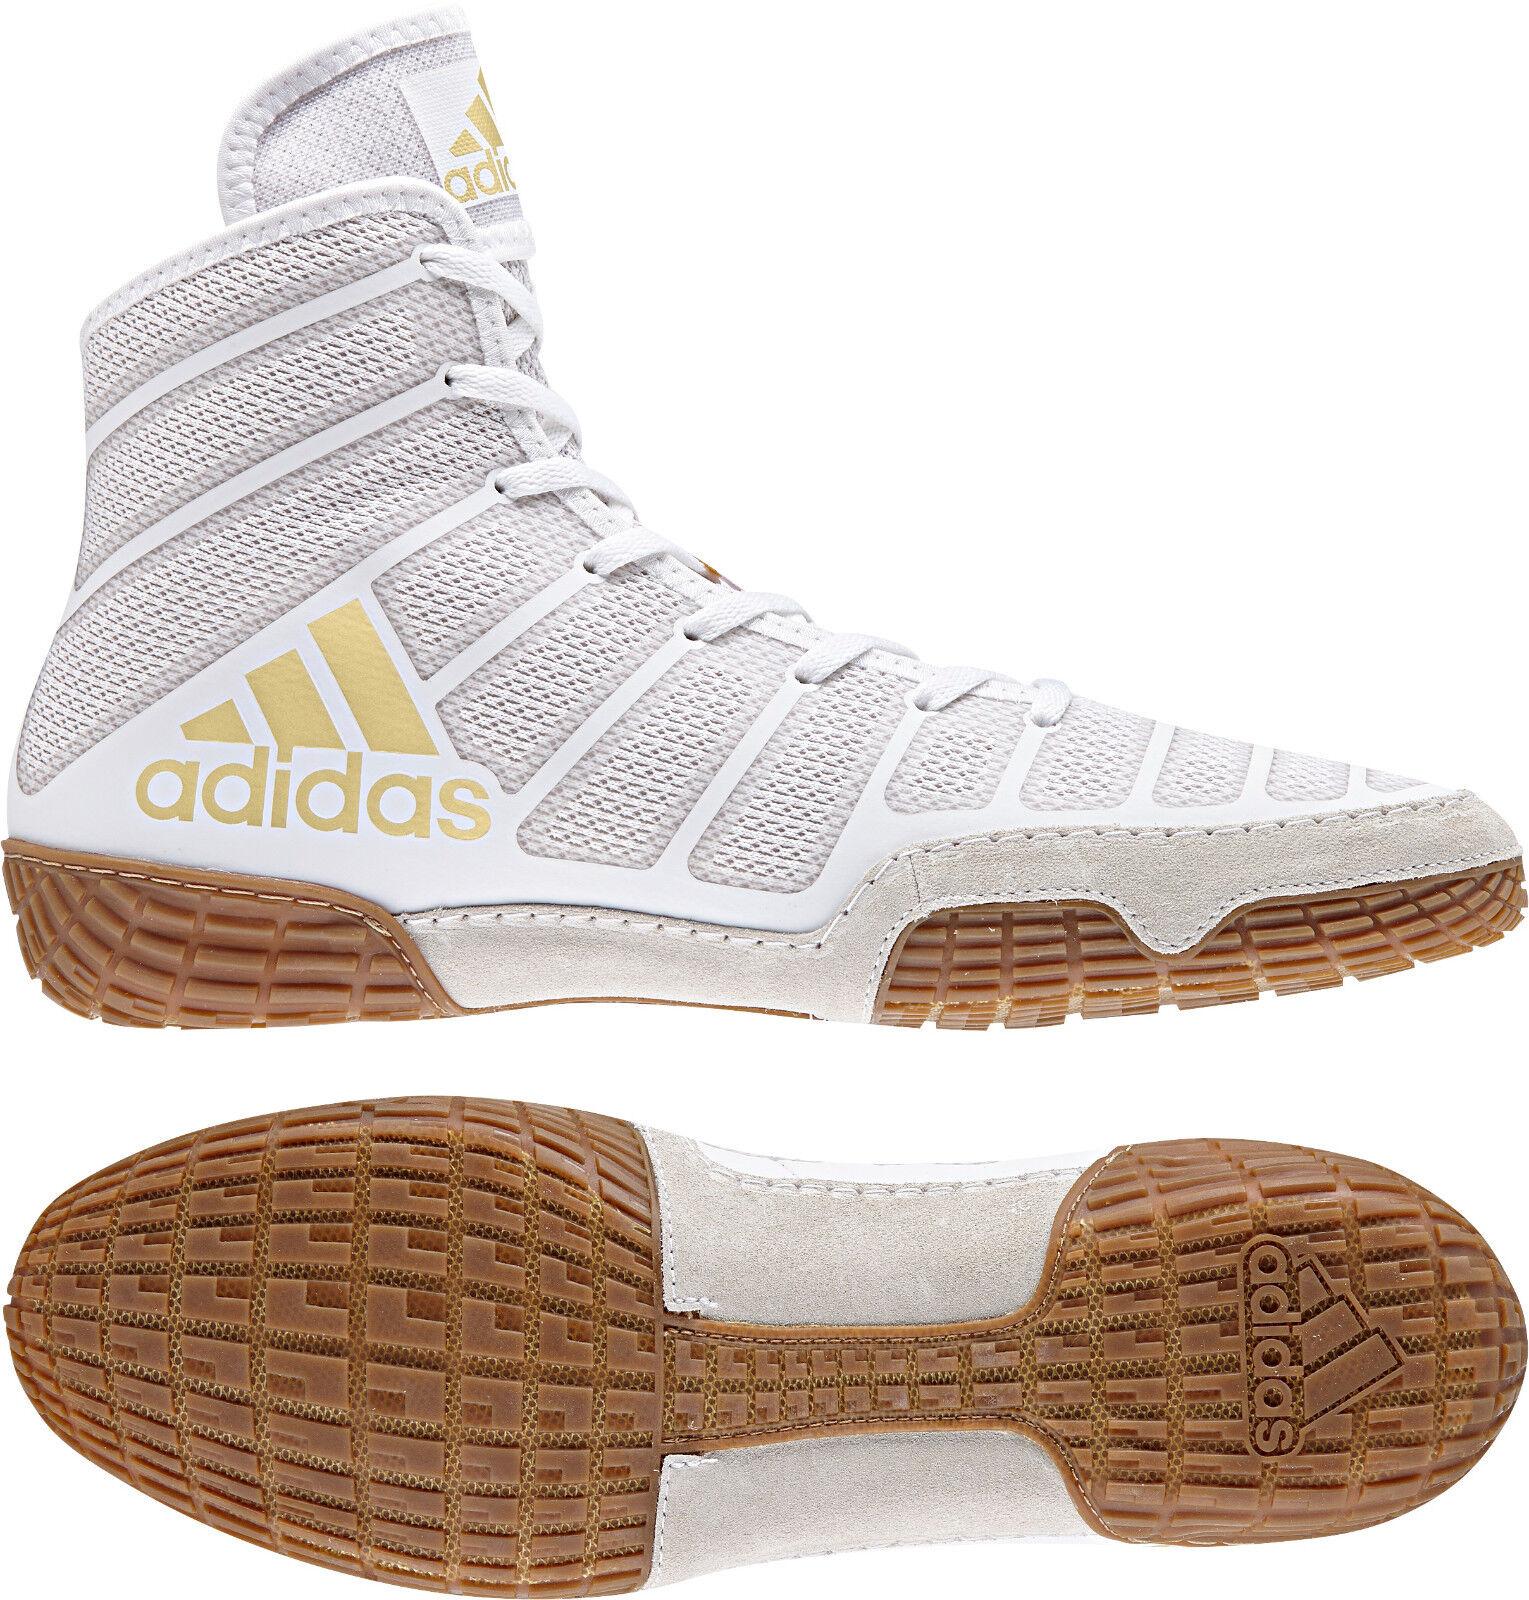 Adidas AdiZero Varner 2 Men's White